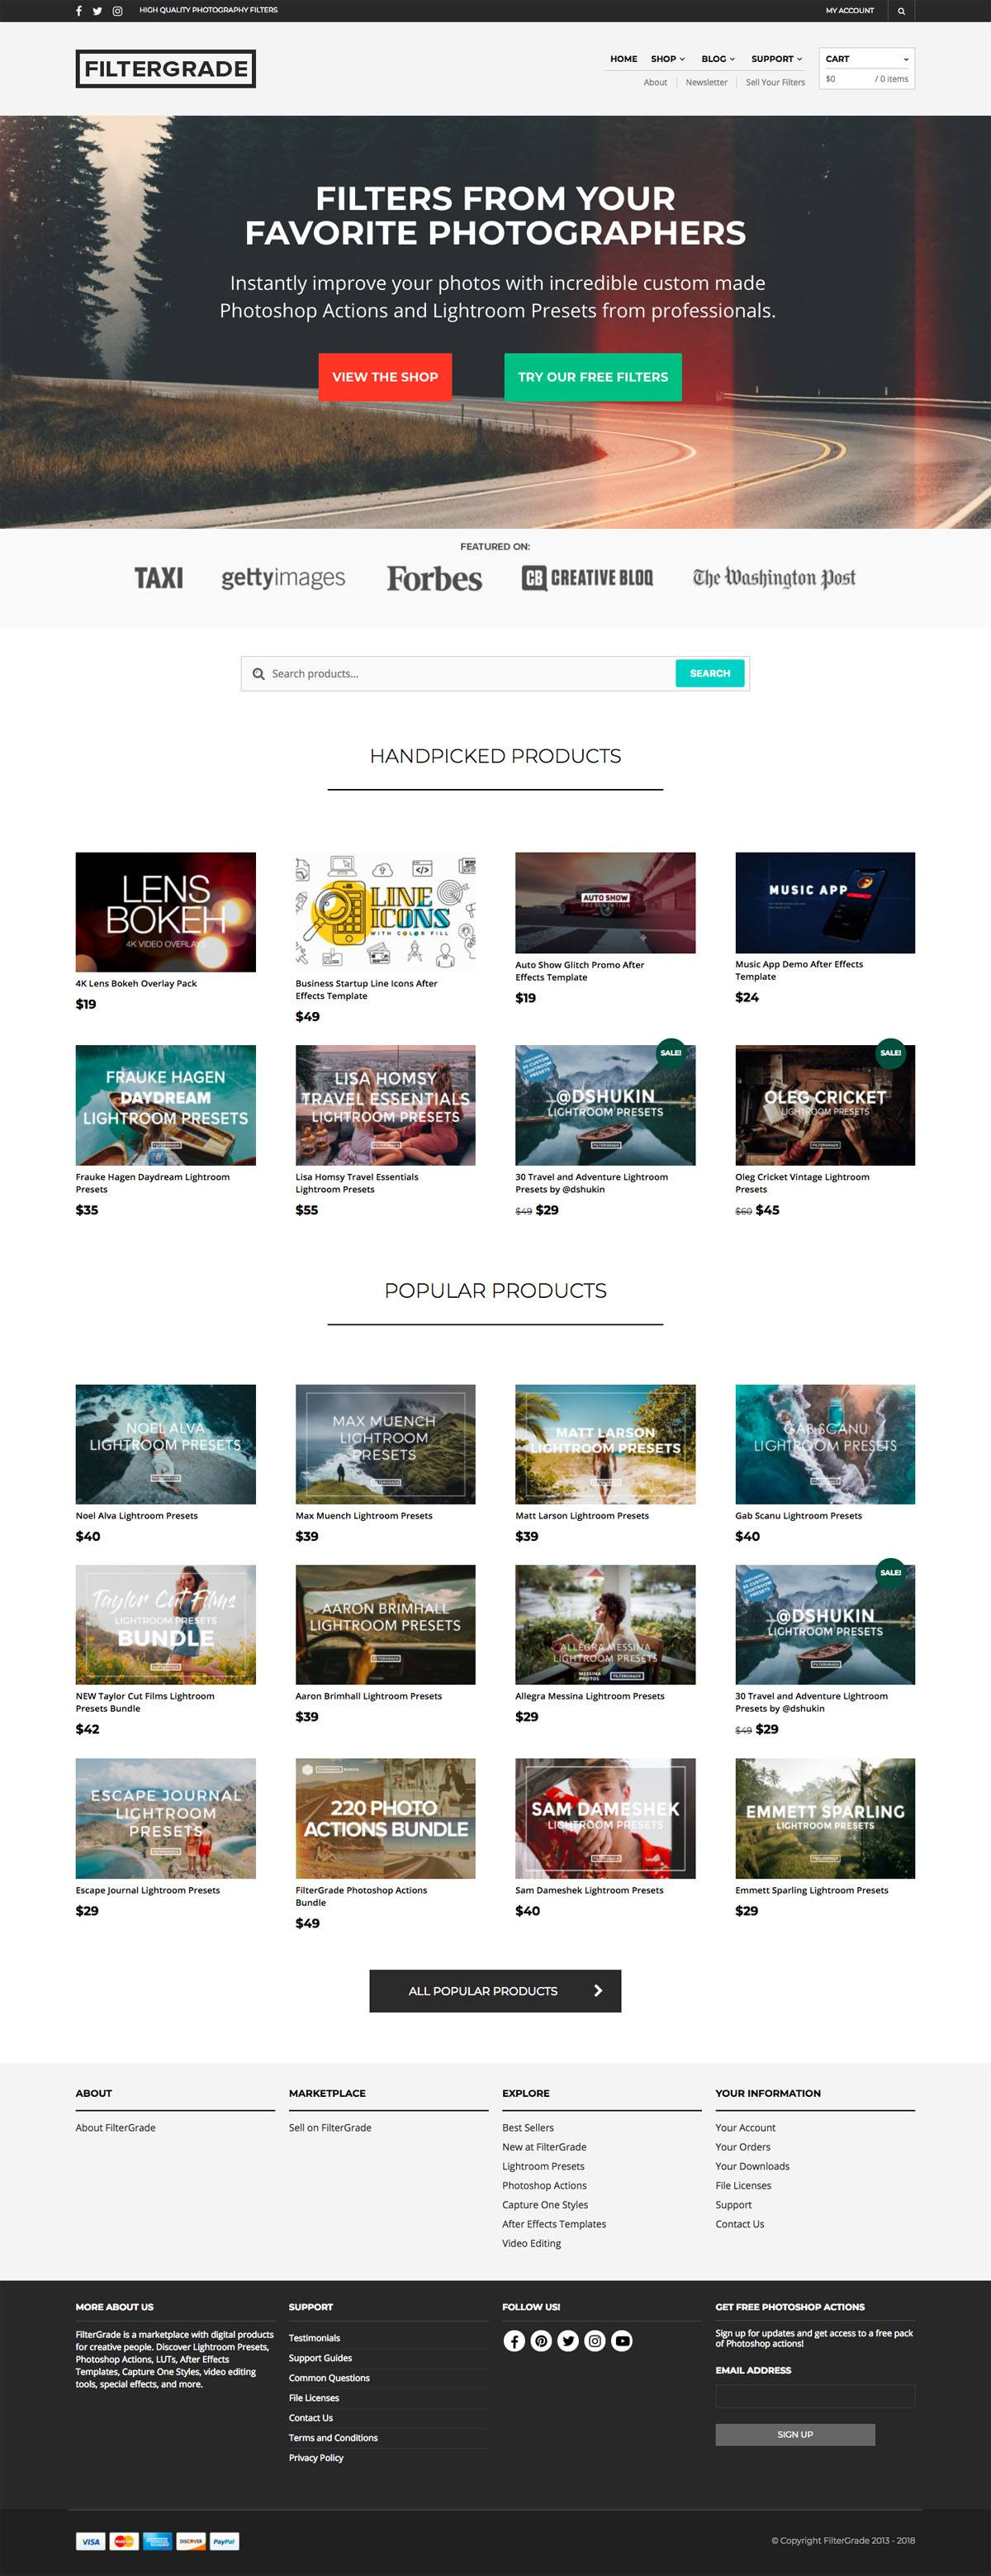 eCommerce website: FilterGrade